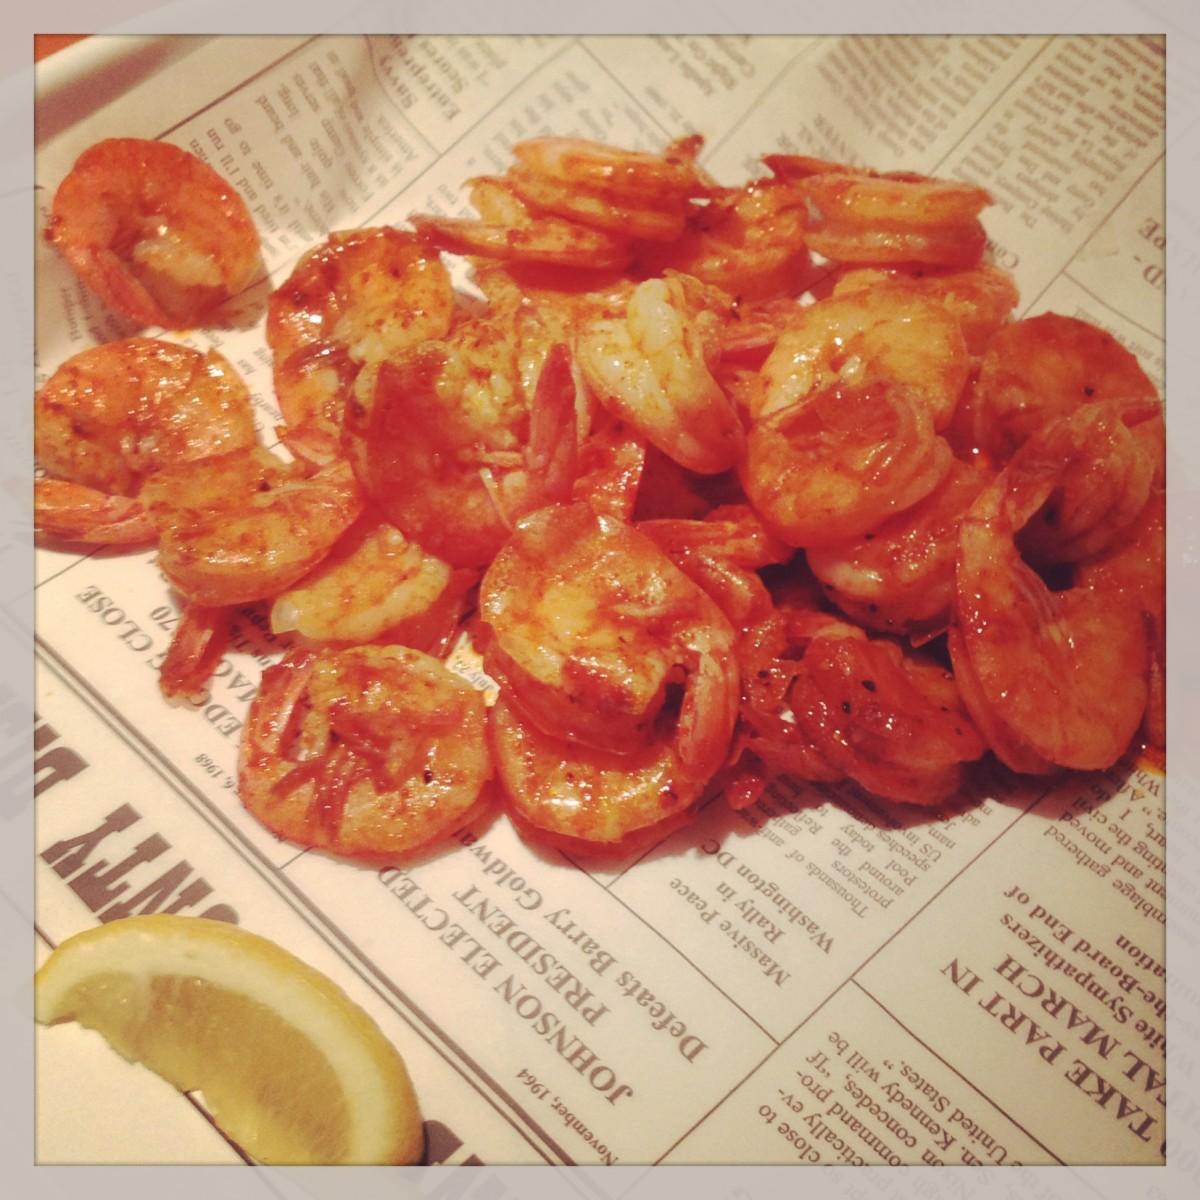 Bucket o'shrimp - Cajun Style - simply delicious!